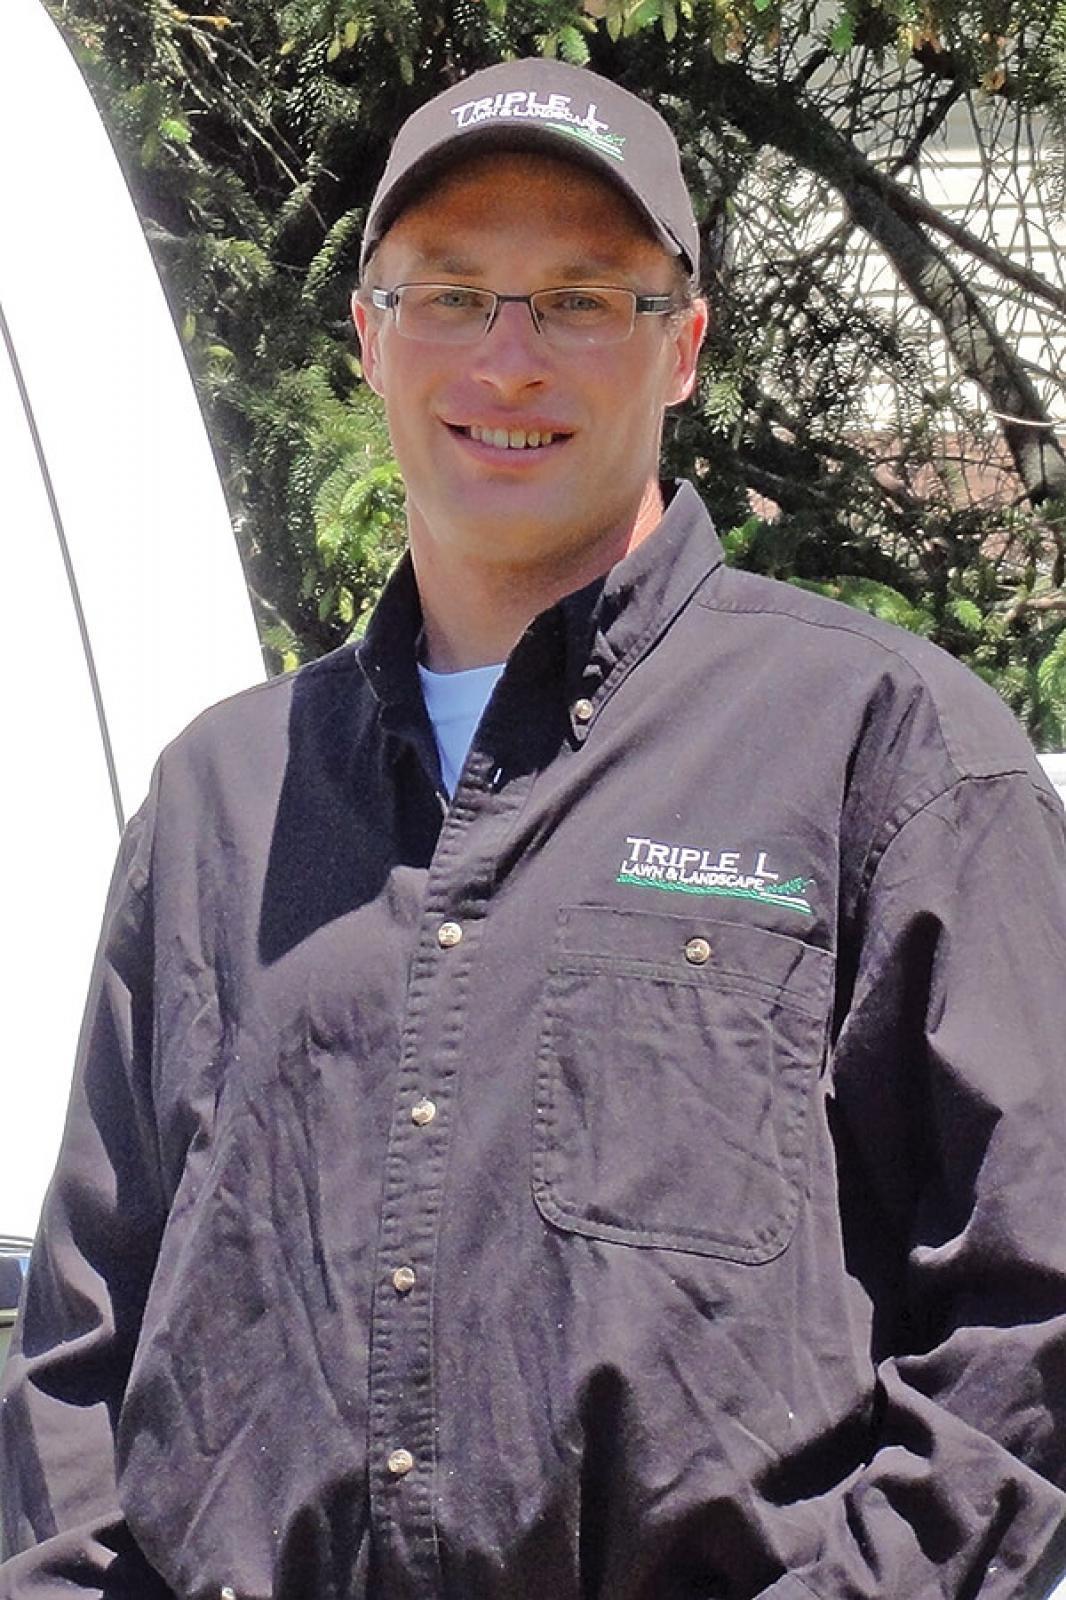 Chad Loewen